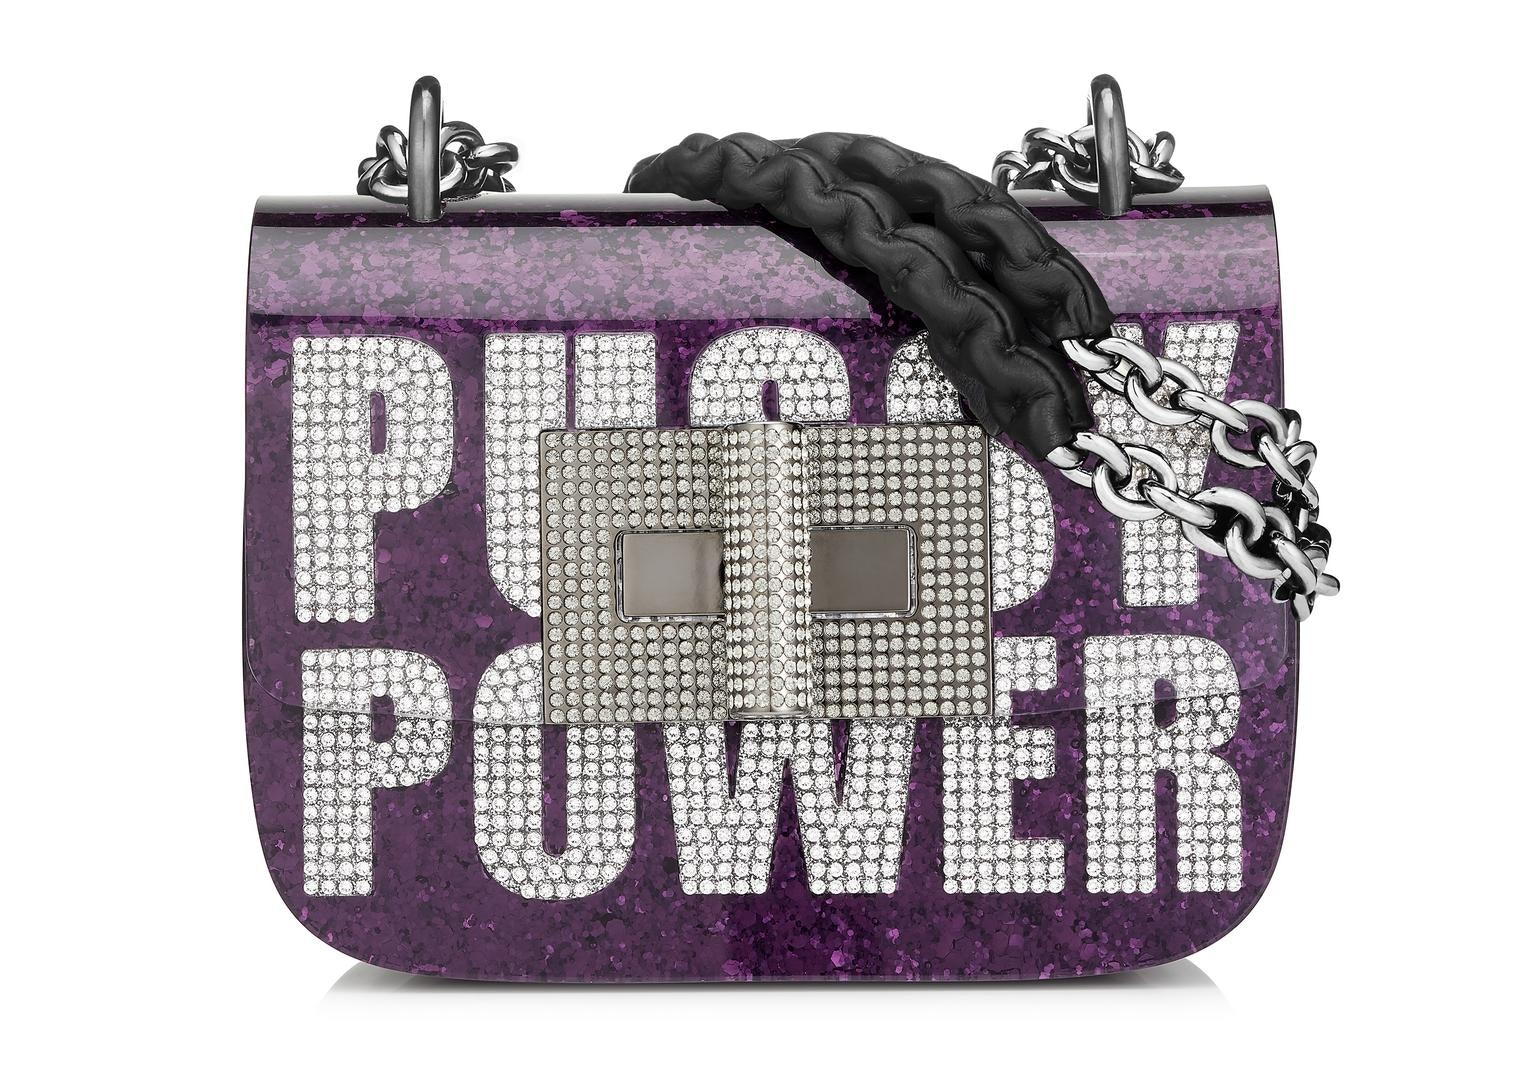 Tom Ford Natalia Shoulder Bag Pussy Power Purple